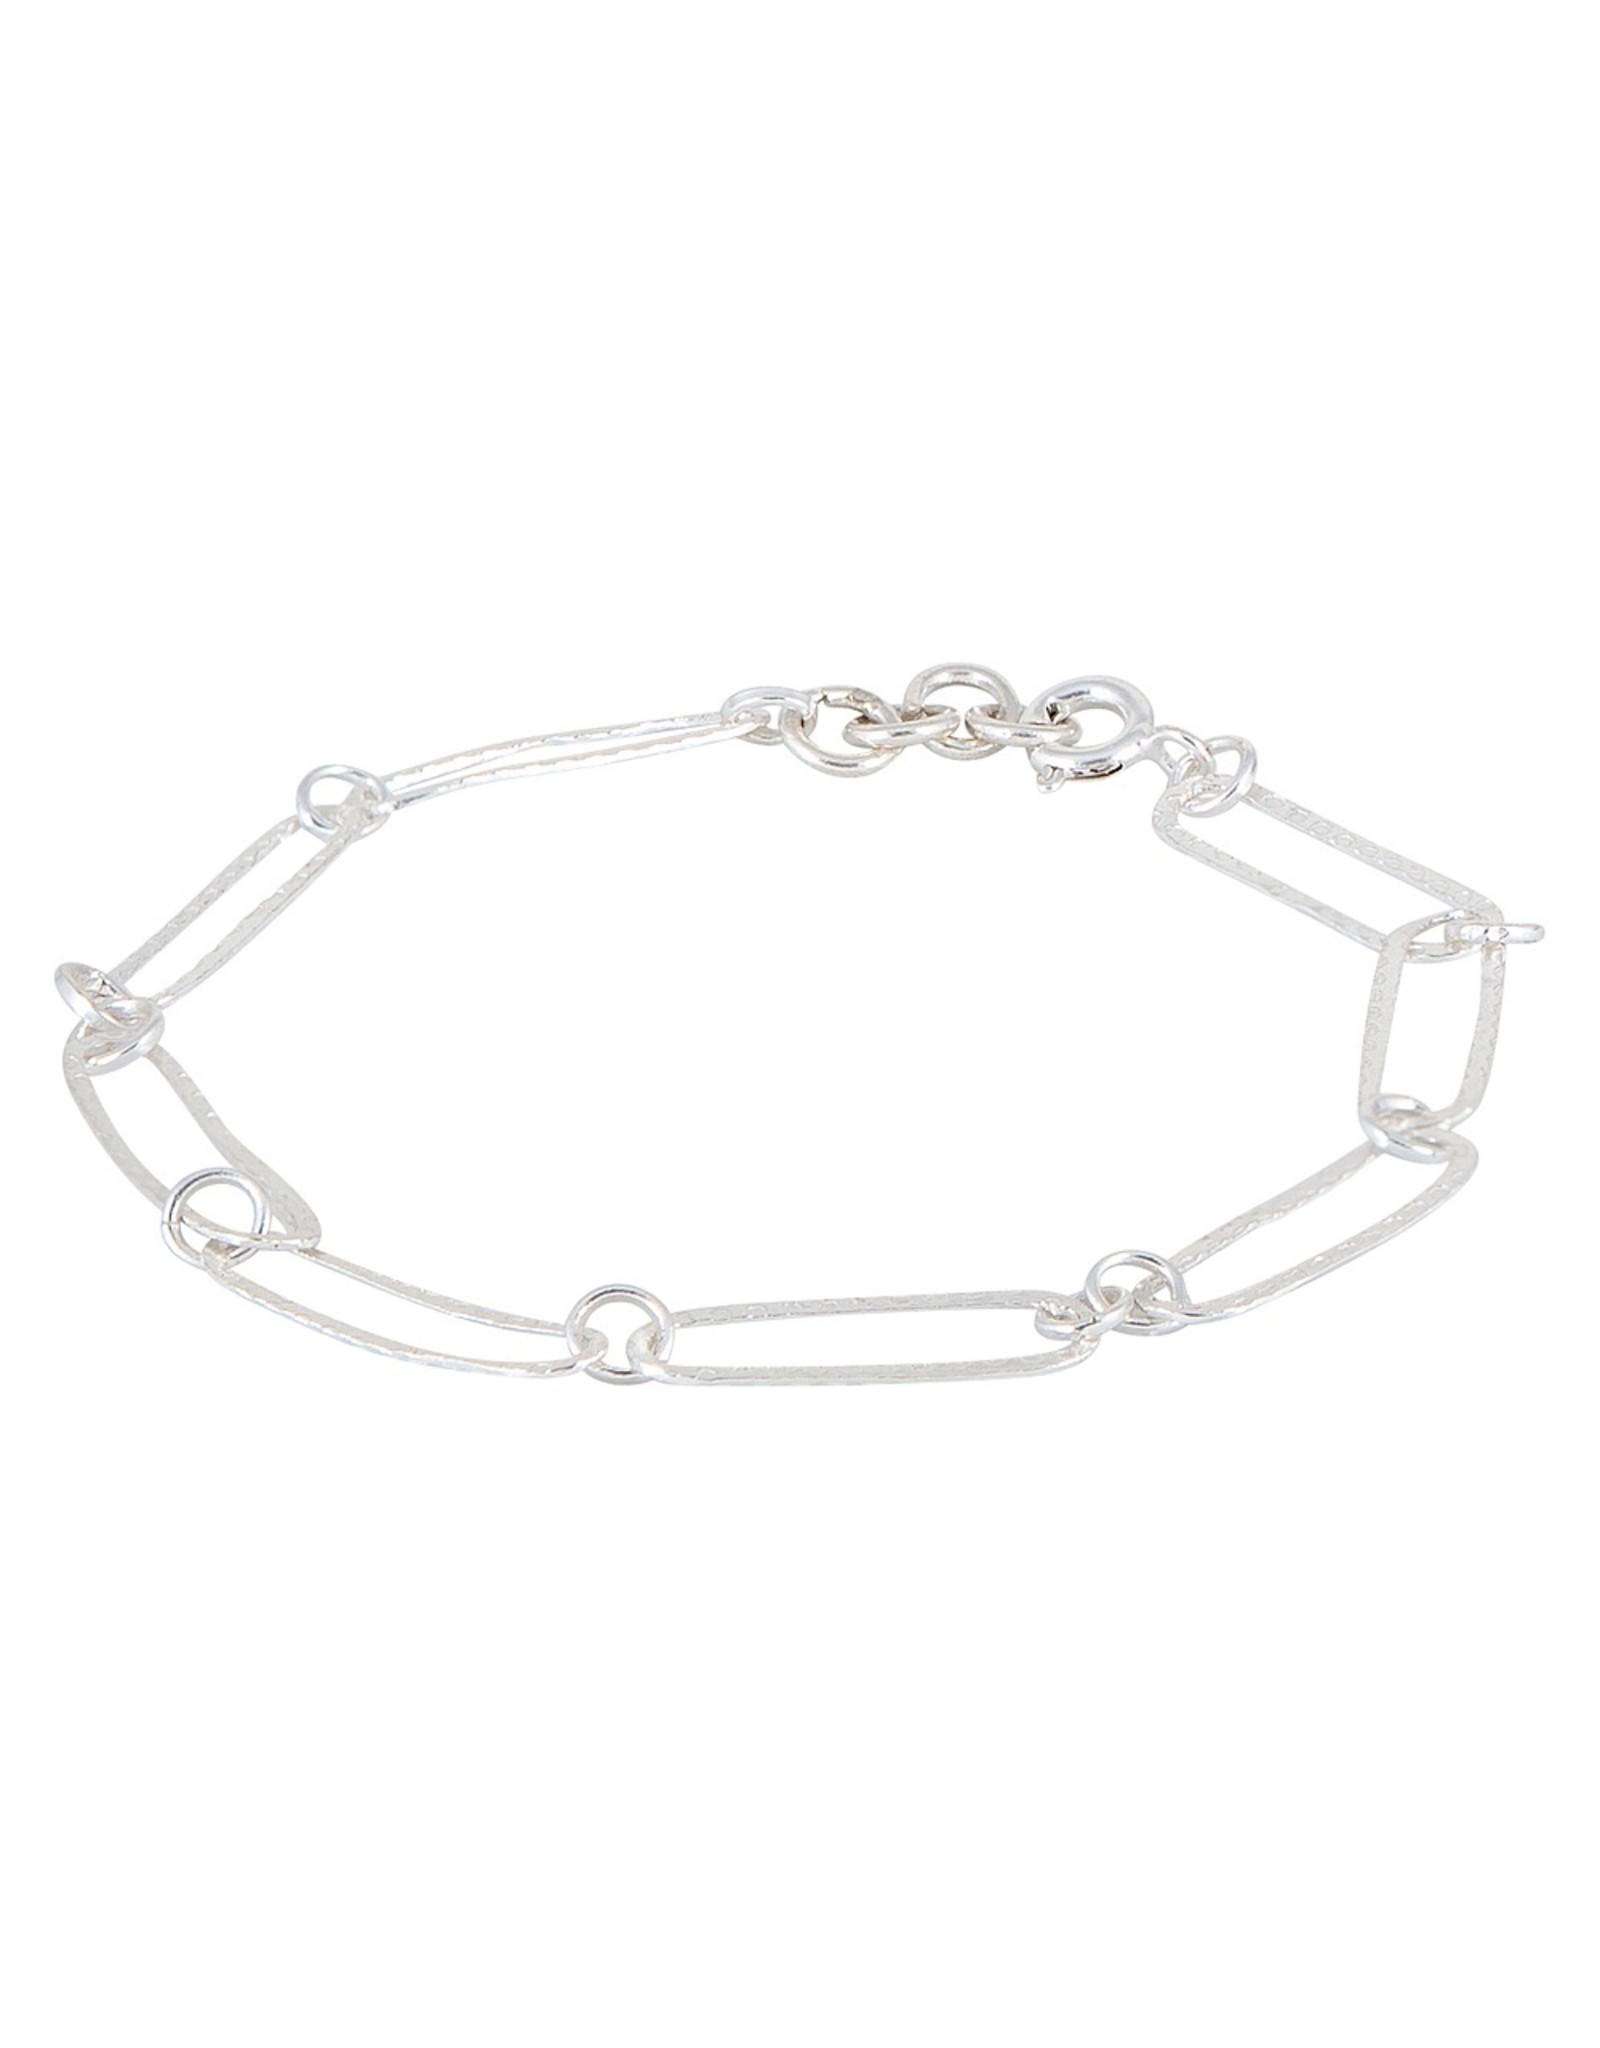 Armband Chain 925 Silber